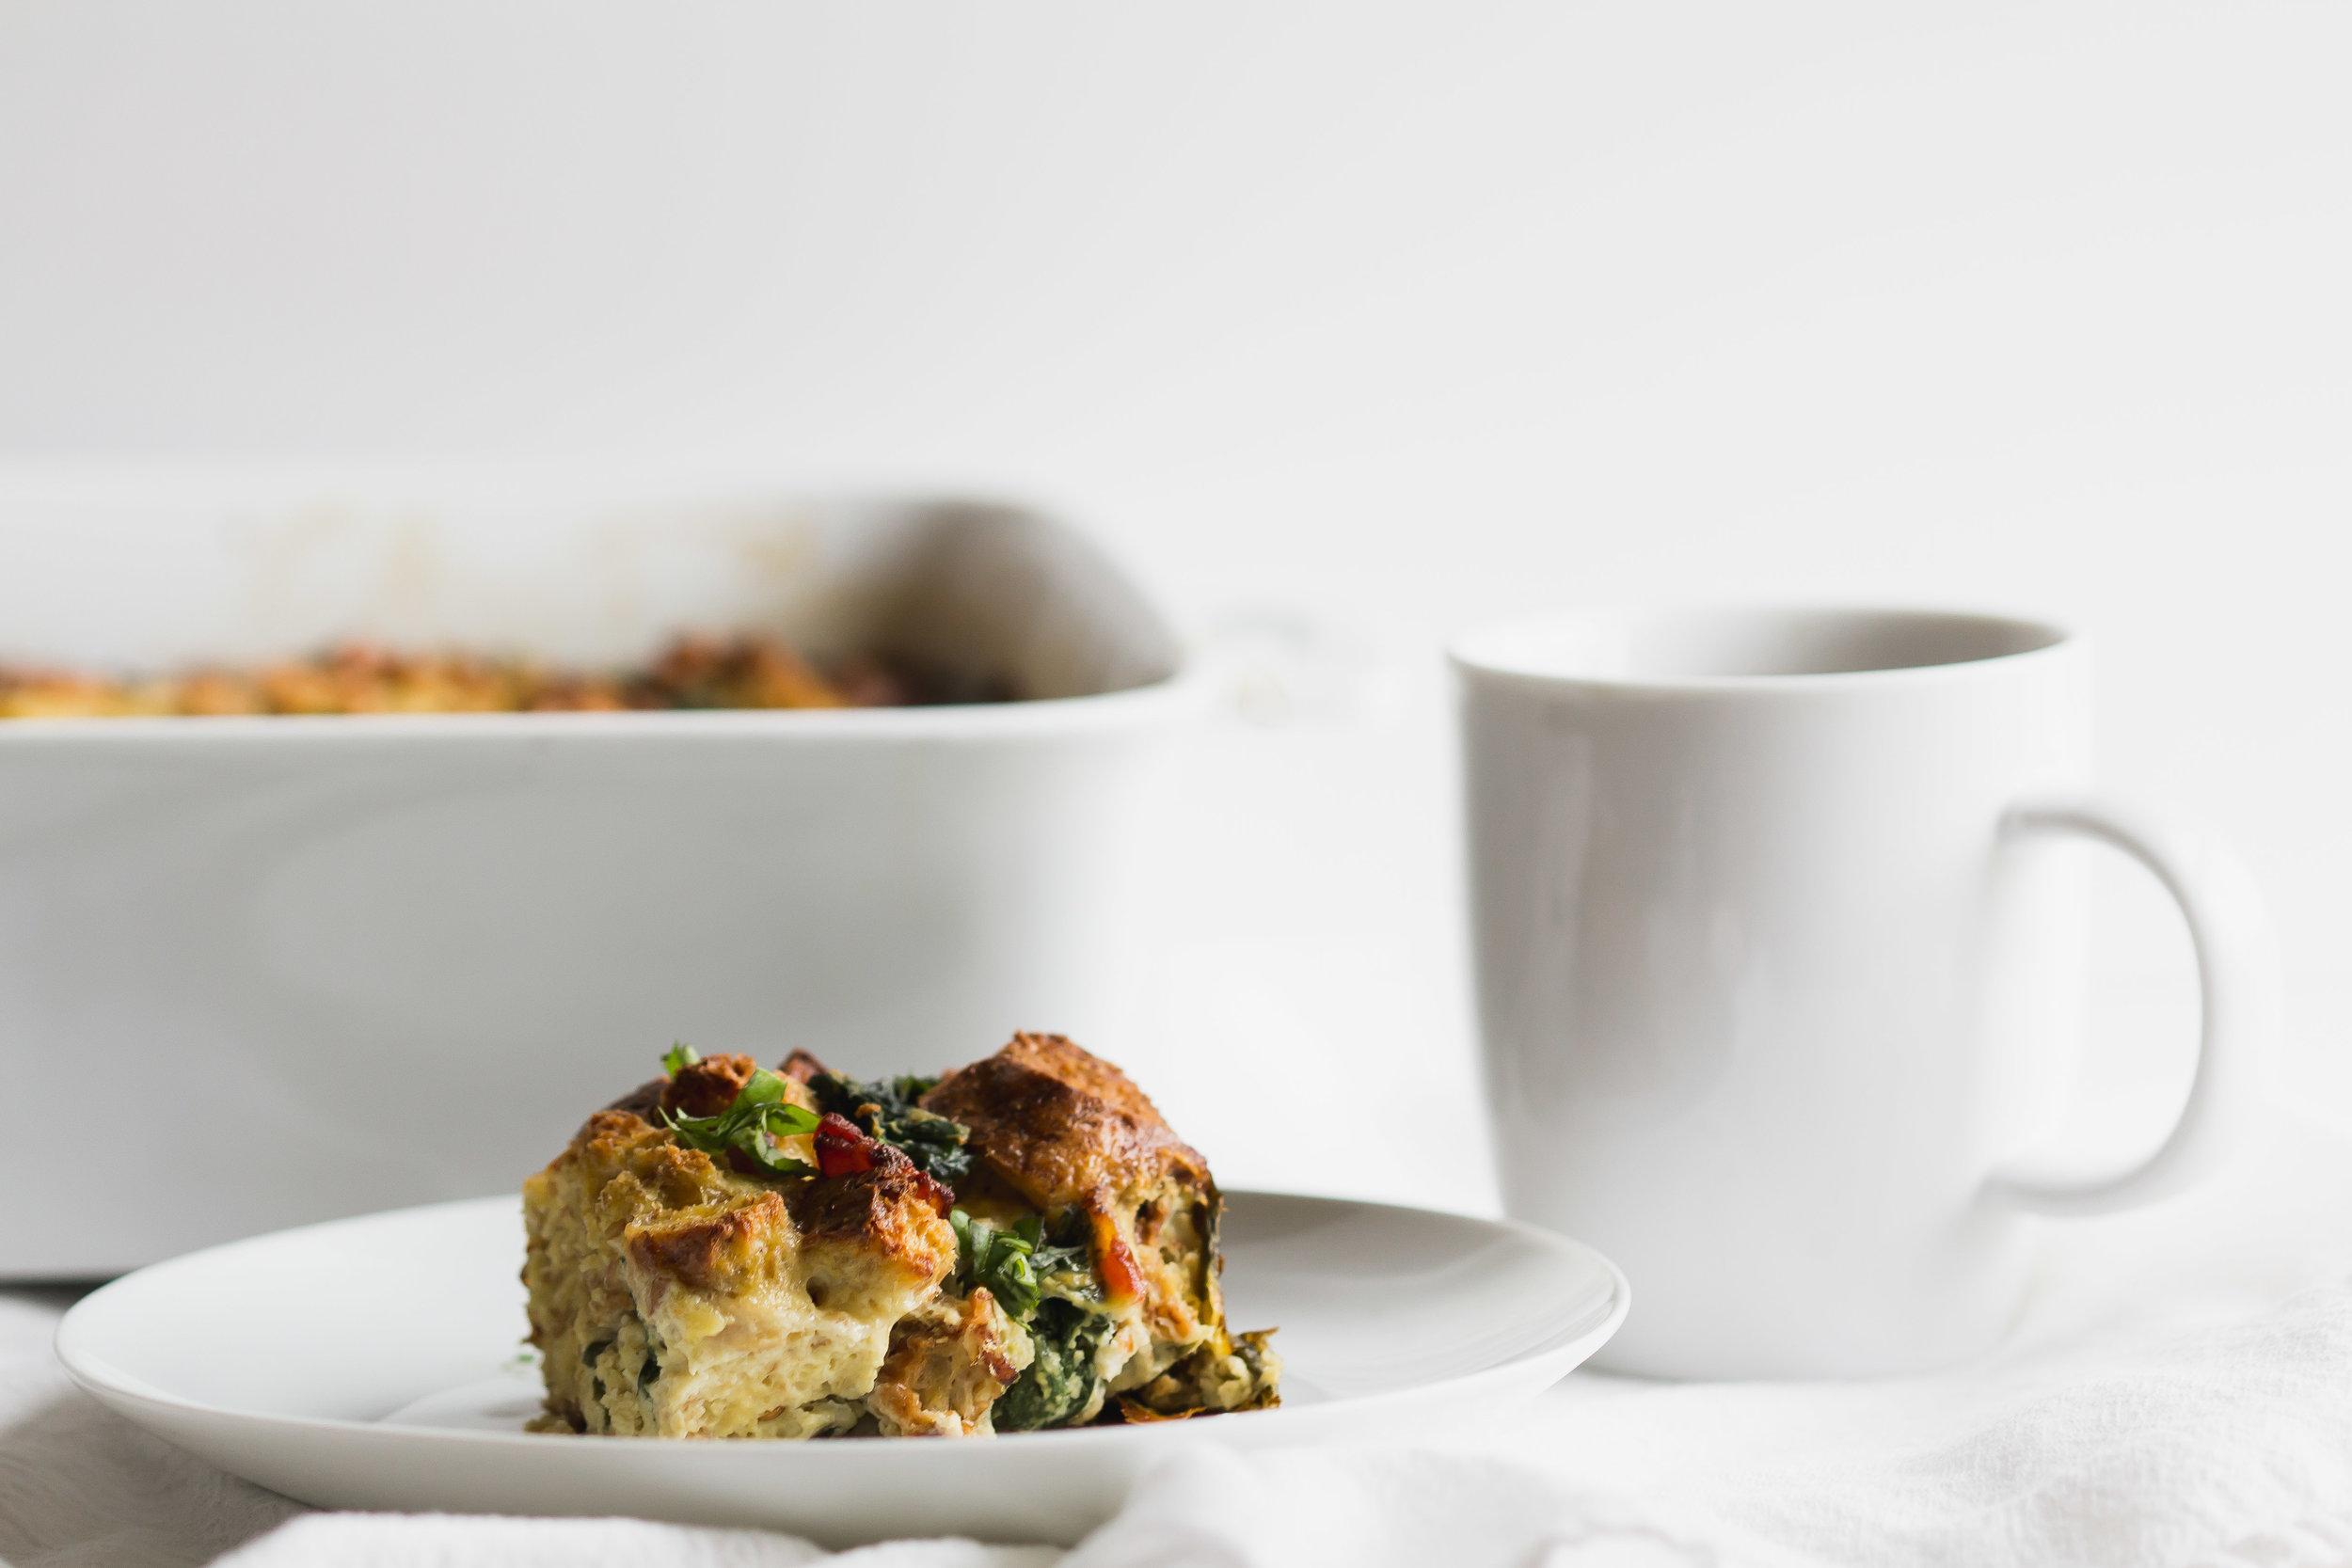 Bacon, Asiago + Spinach Breakfast Casserole | Sarah J. Hauser